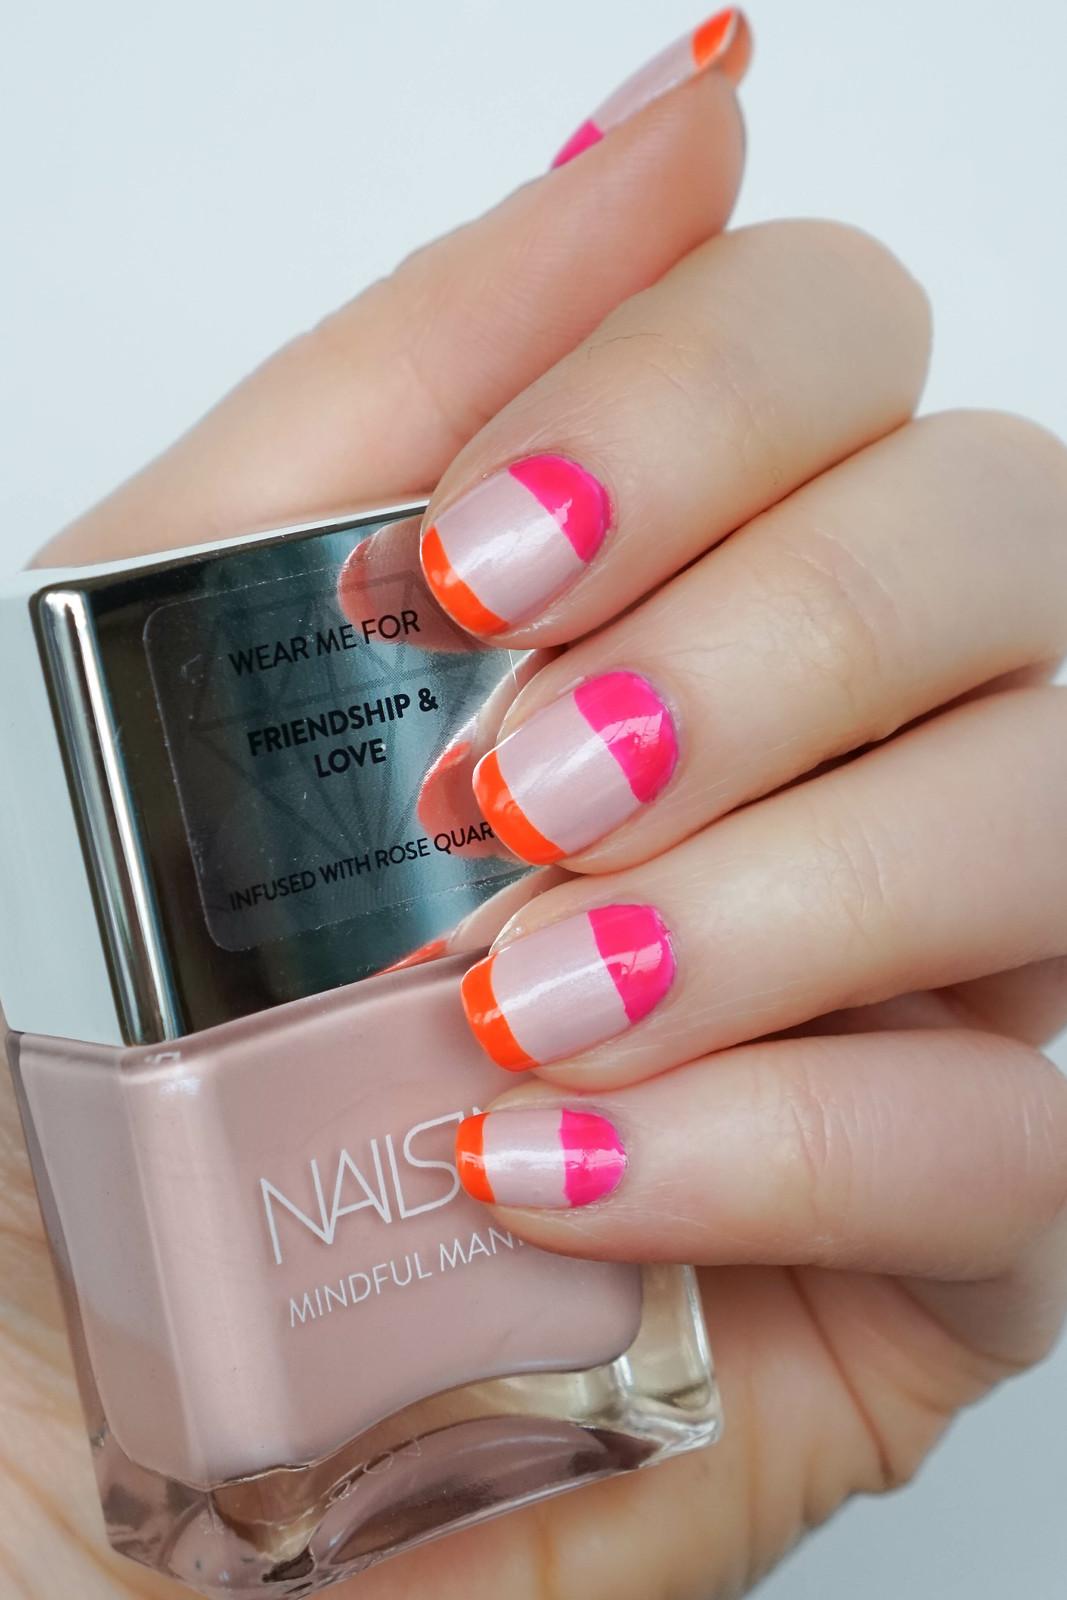 Crystal Infused Nail Polish   Nails Inc Mindful Manicure